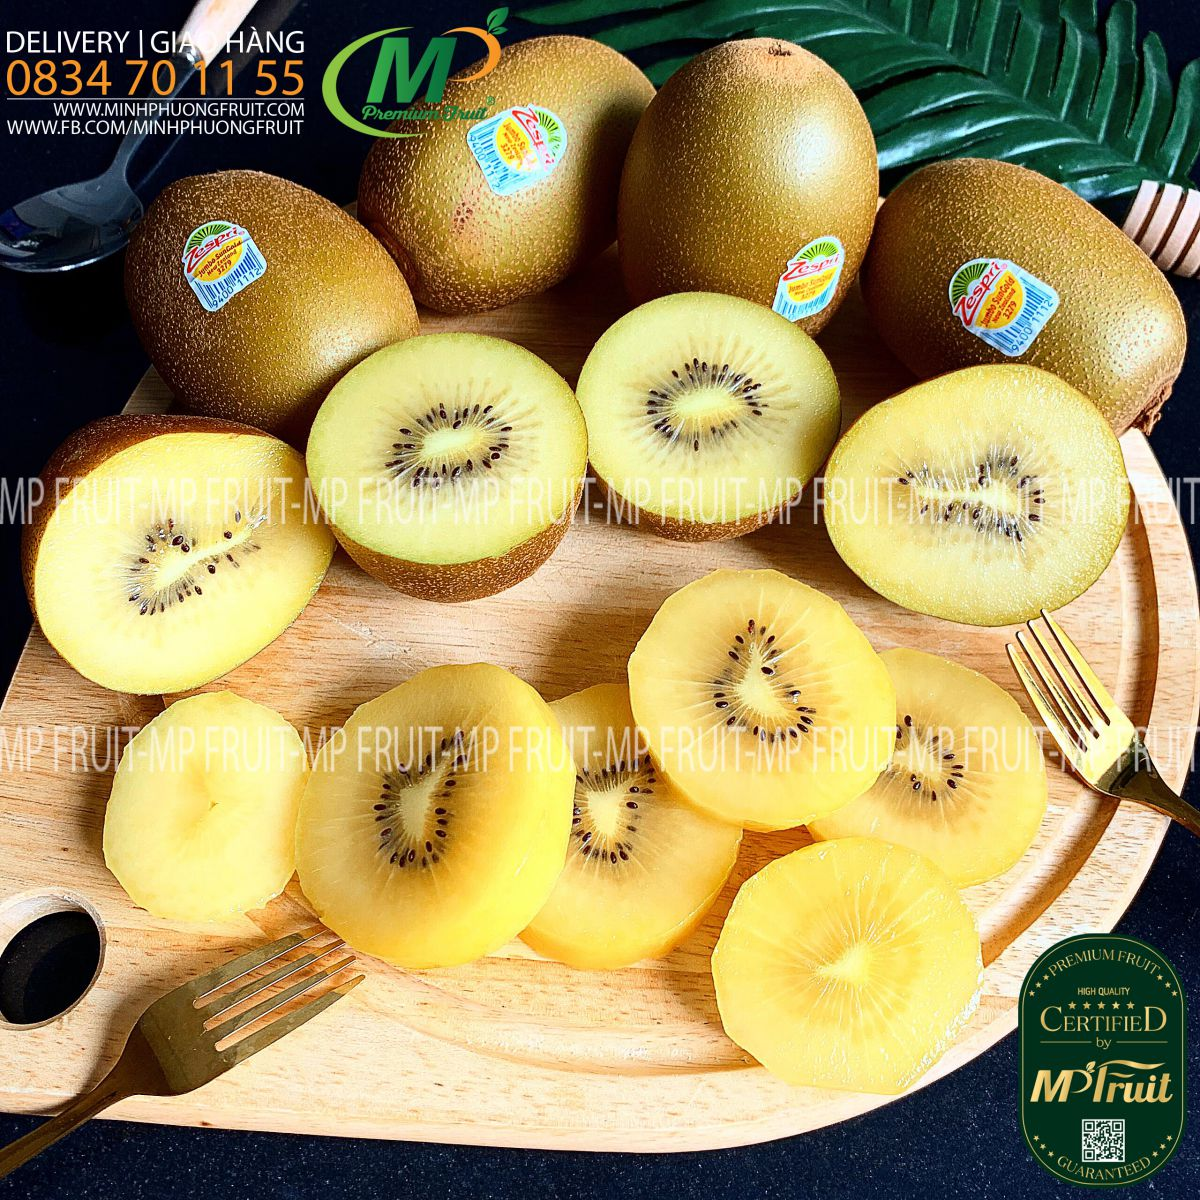 Kiwi Vàng Zespri Jumbo Sungold New Zealand tại MP Fruit